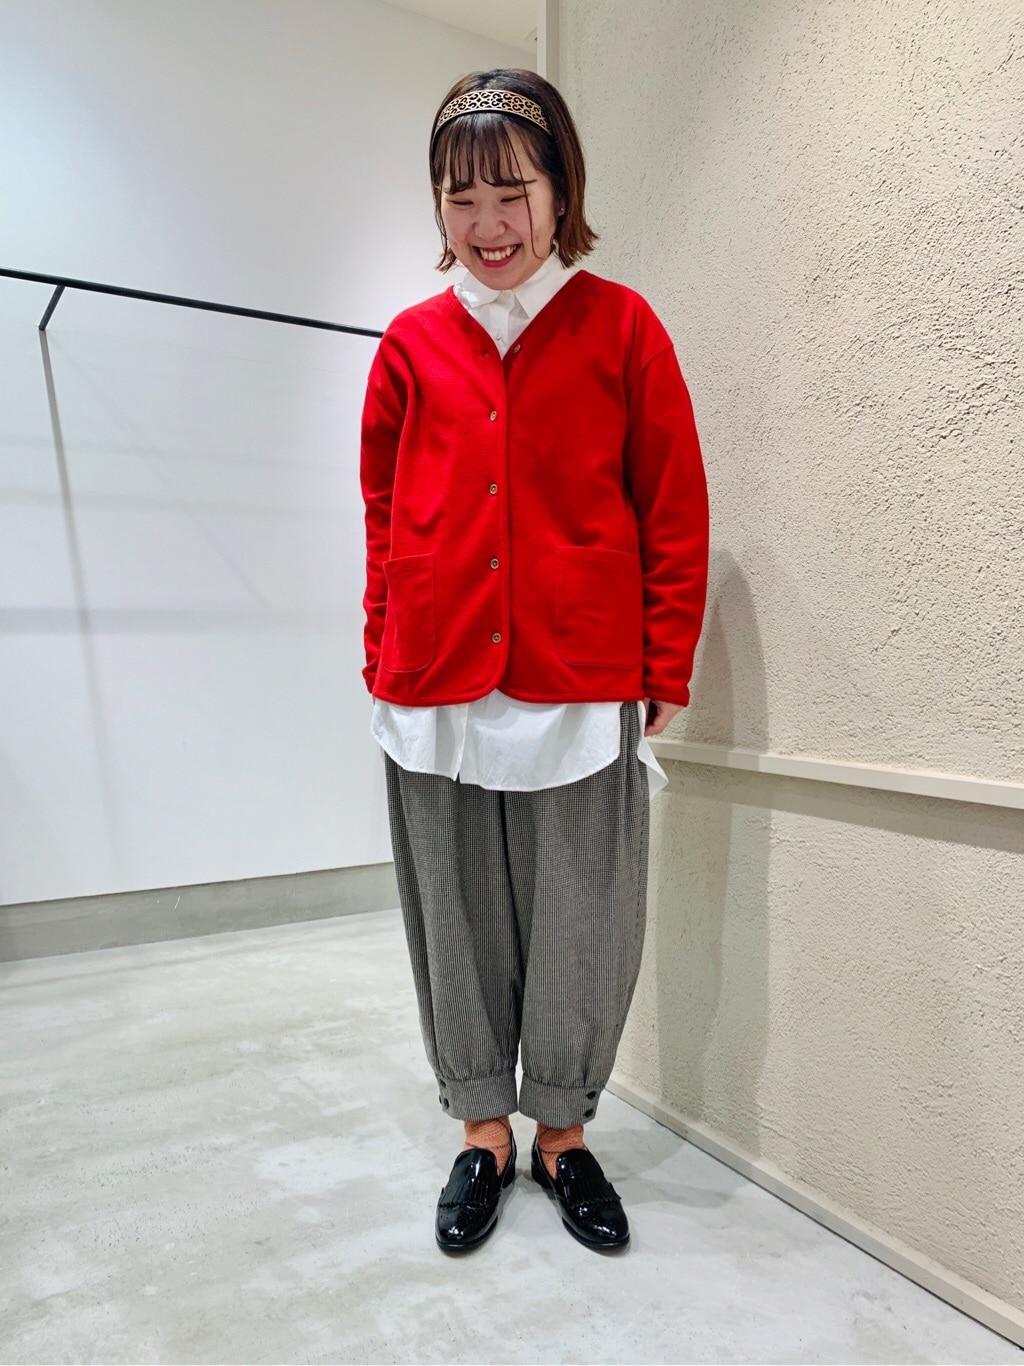 chambre de charme 横浜ジョイナス 身長:155cm 2020.11.05